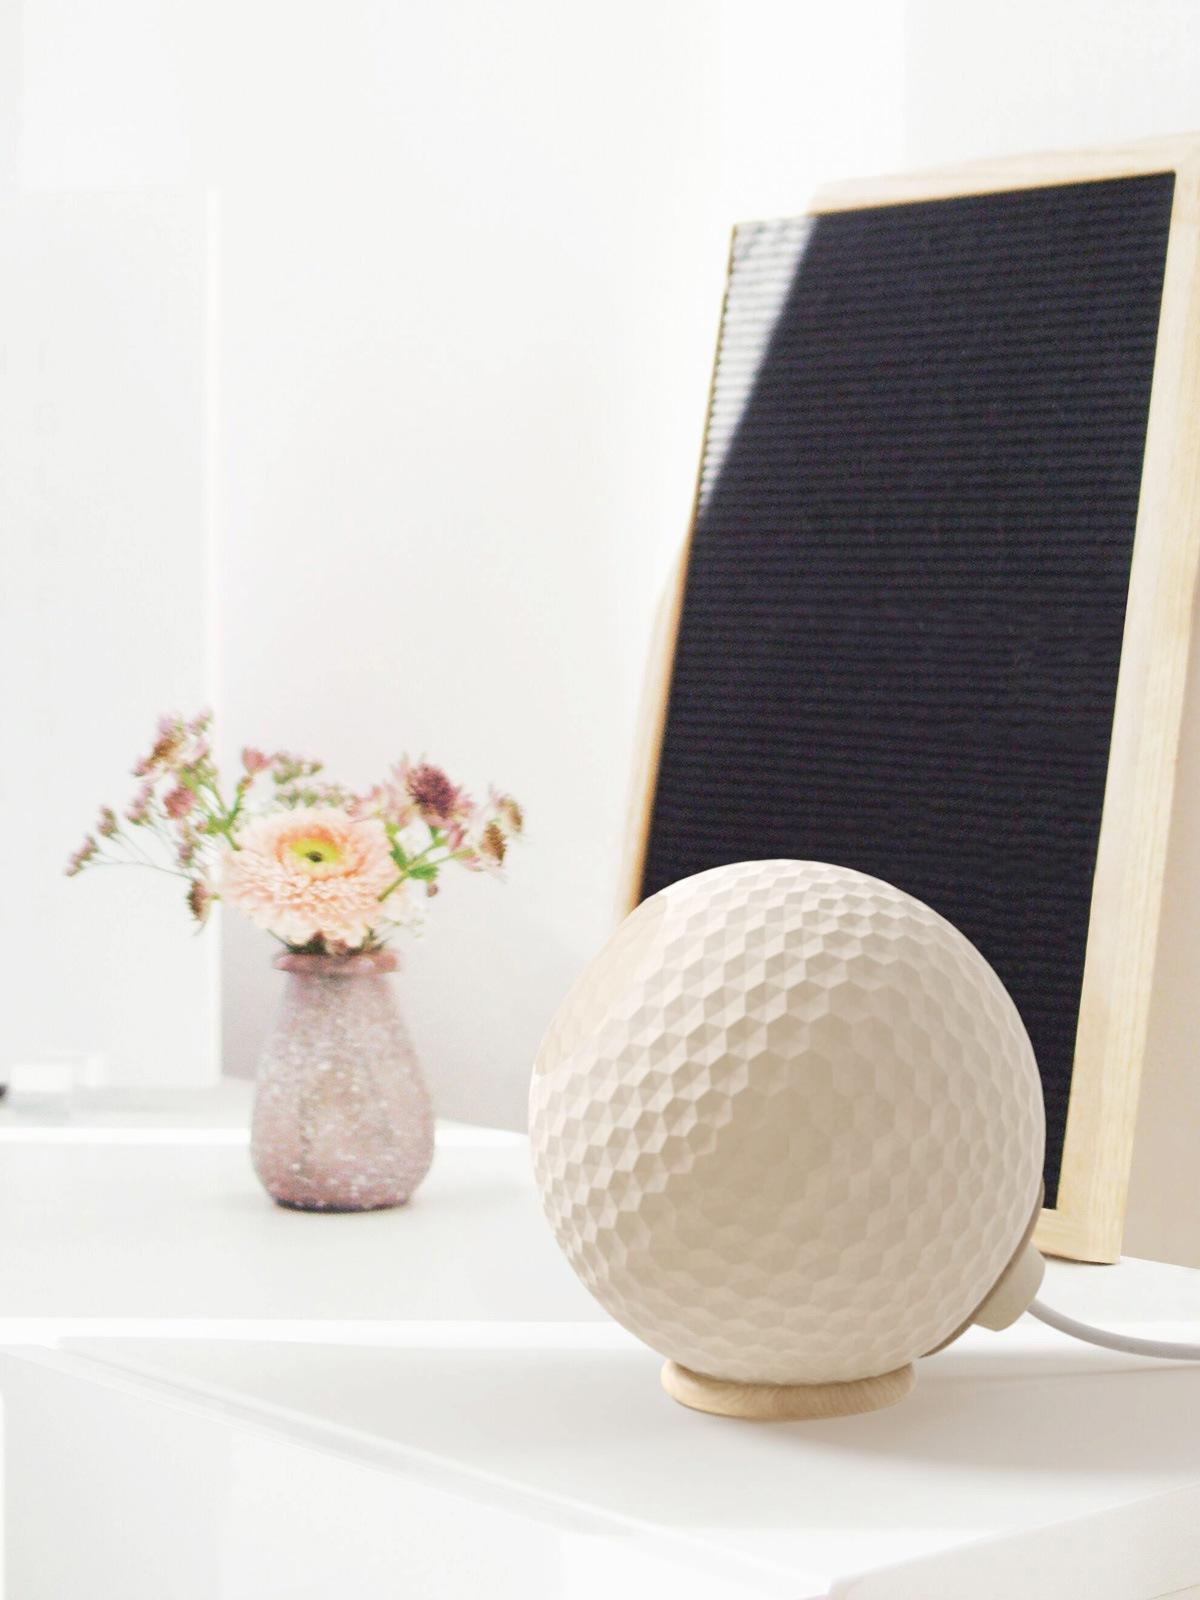 Mono Table Flachs Polyluma Lampe Designort Onlineshop Berlin